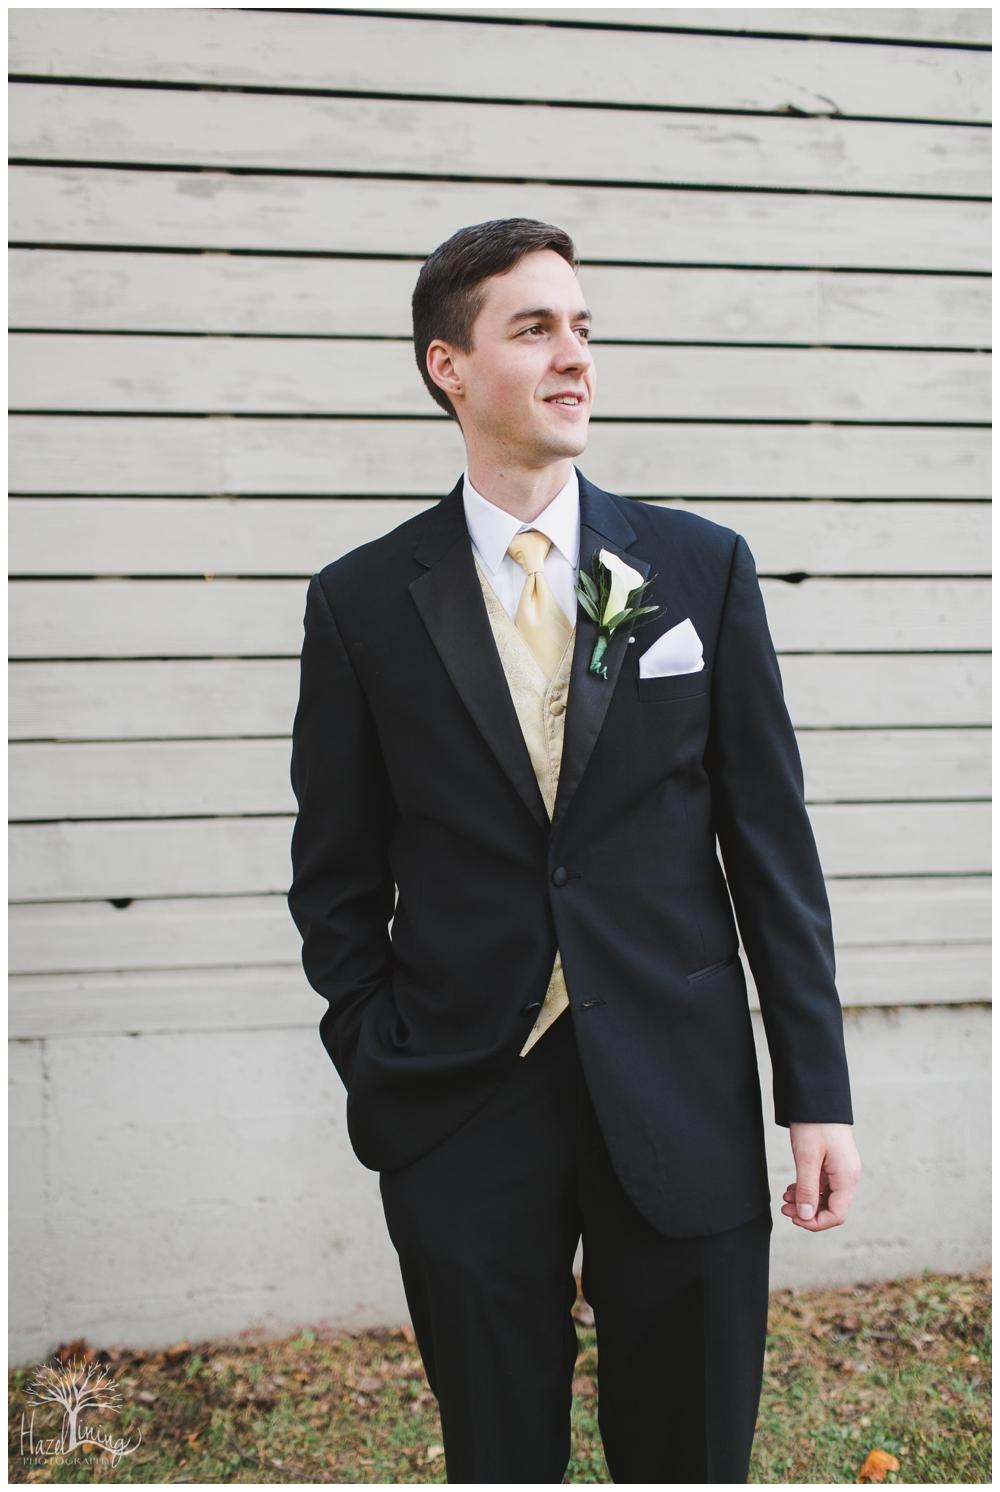 hazel-lining-photography-wedding-portrait-buckscounty-pennsylvania-stephanie-reif_0307.jpg